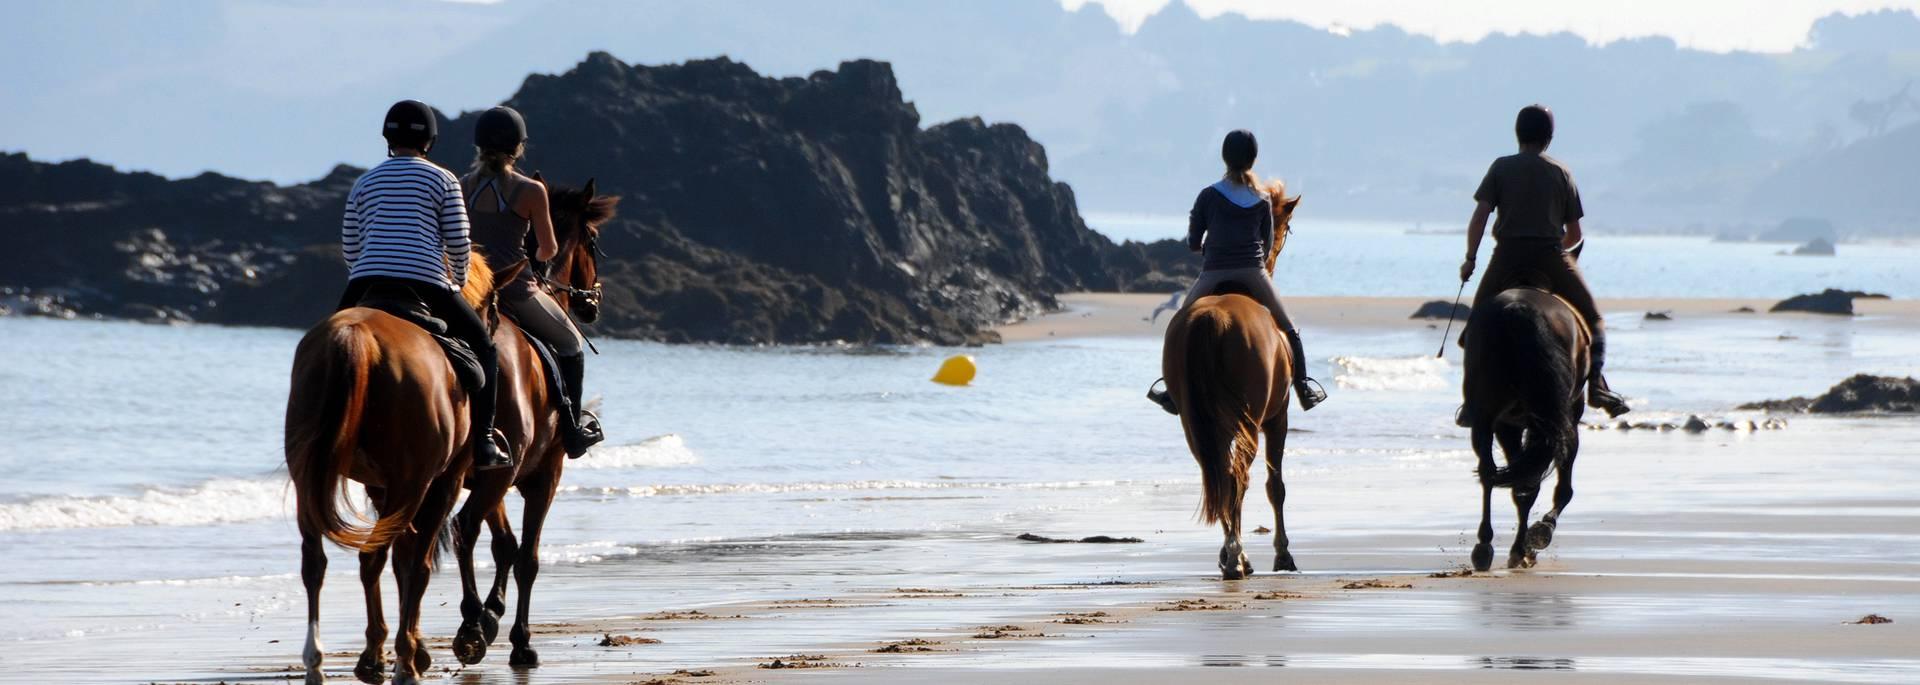 A cheval à la plage ©F.Hamon